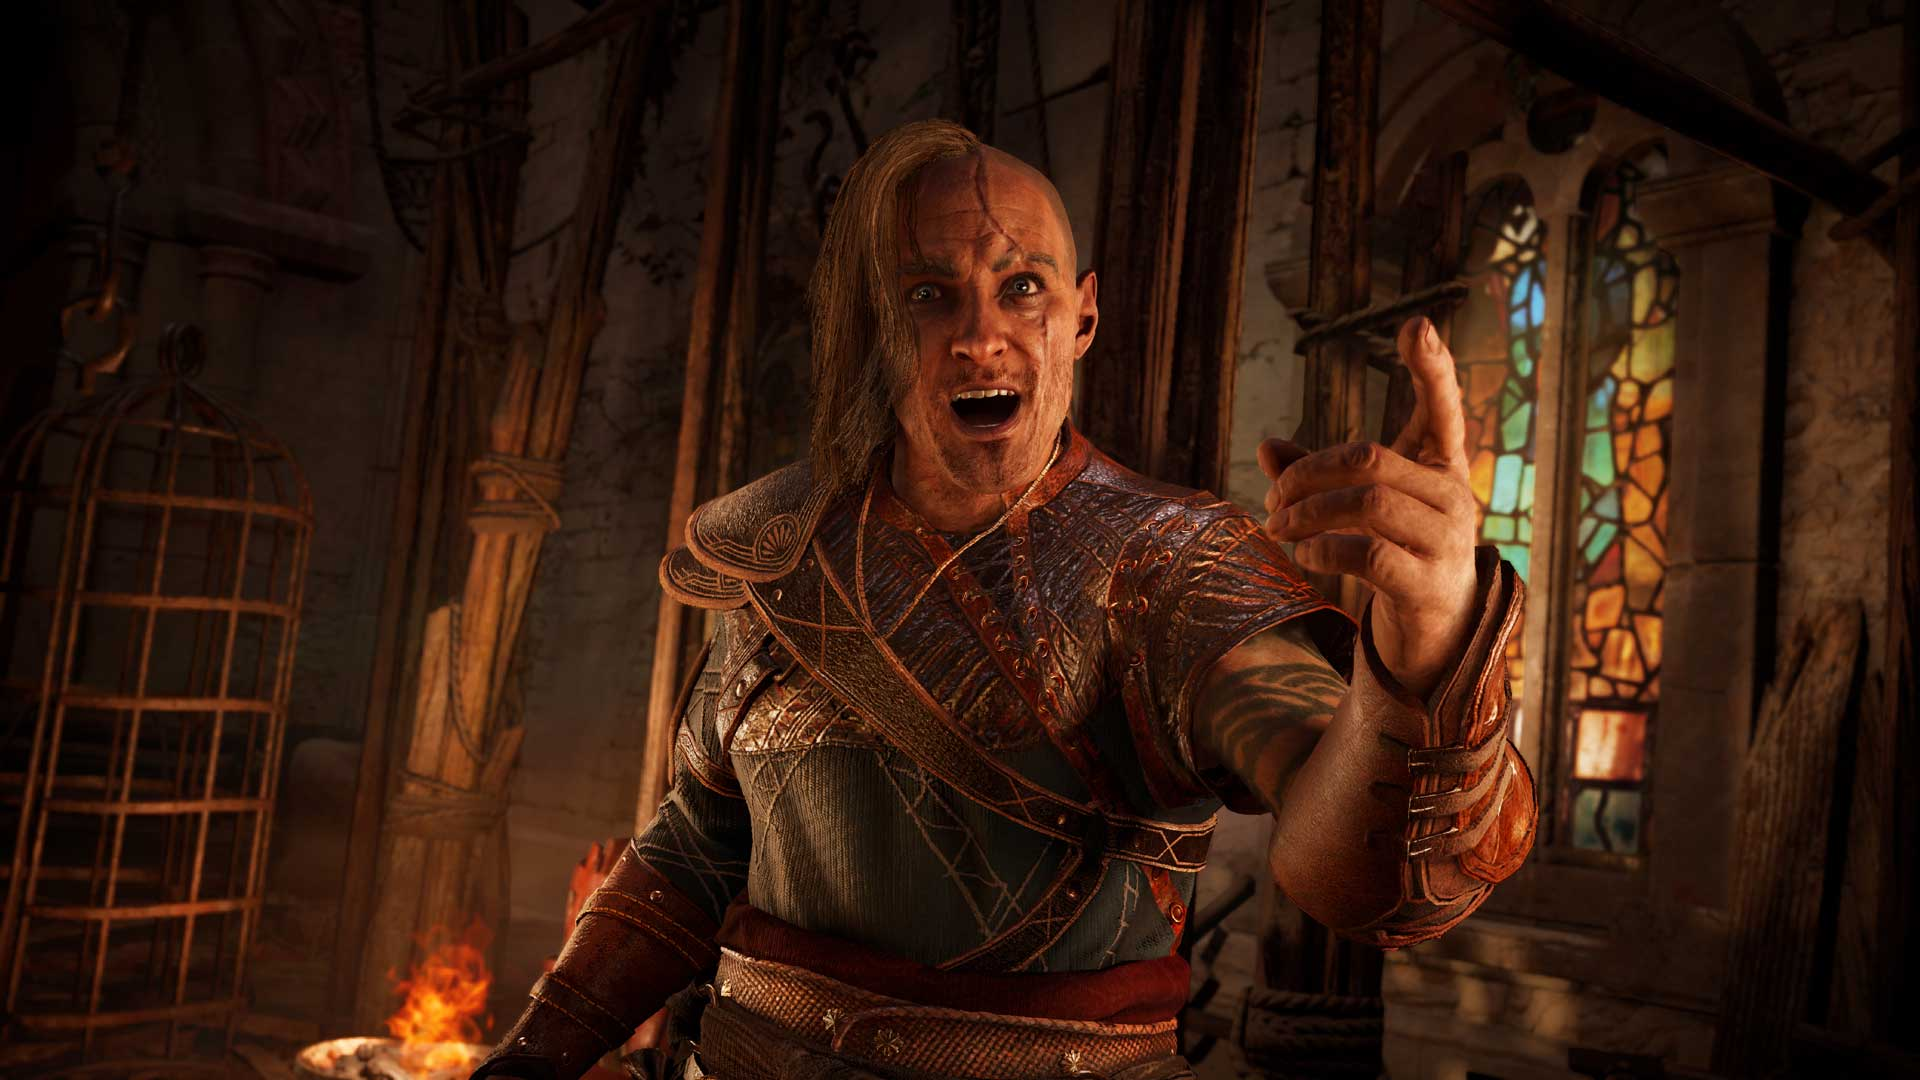 Assassin's Creed Valhalla Siege of Paris Sigrblot Festival